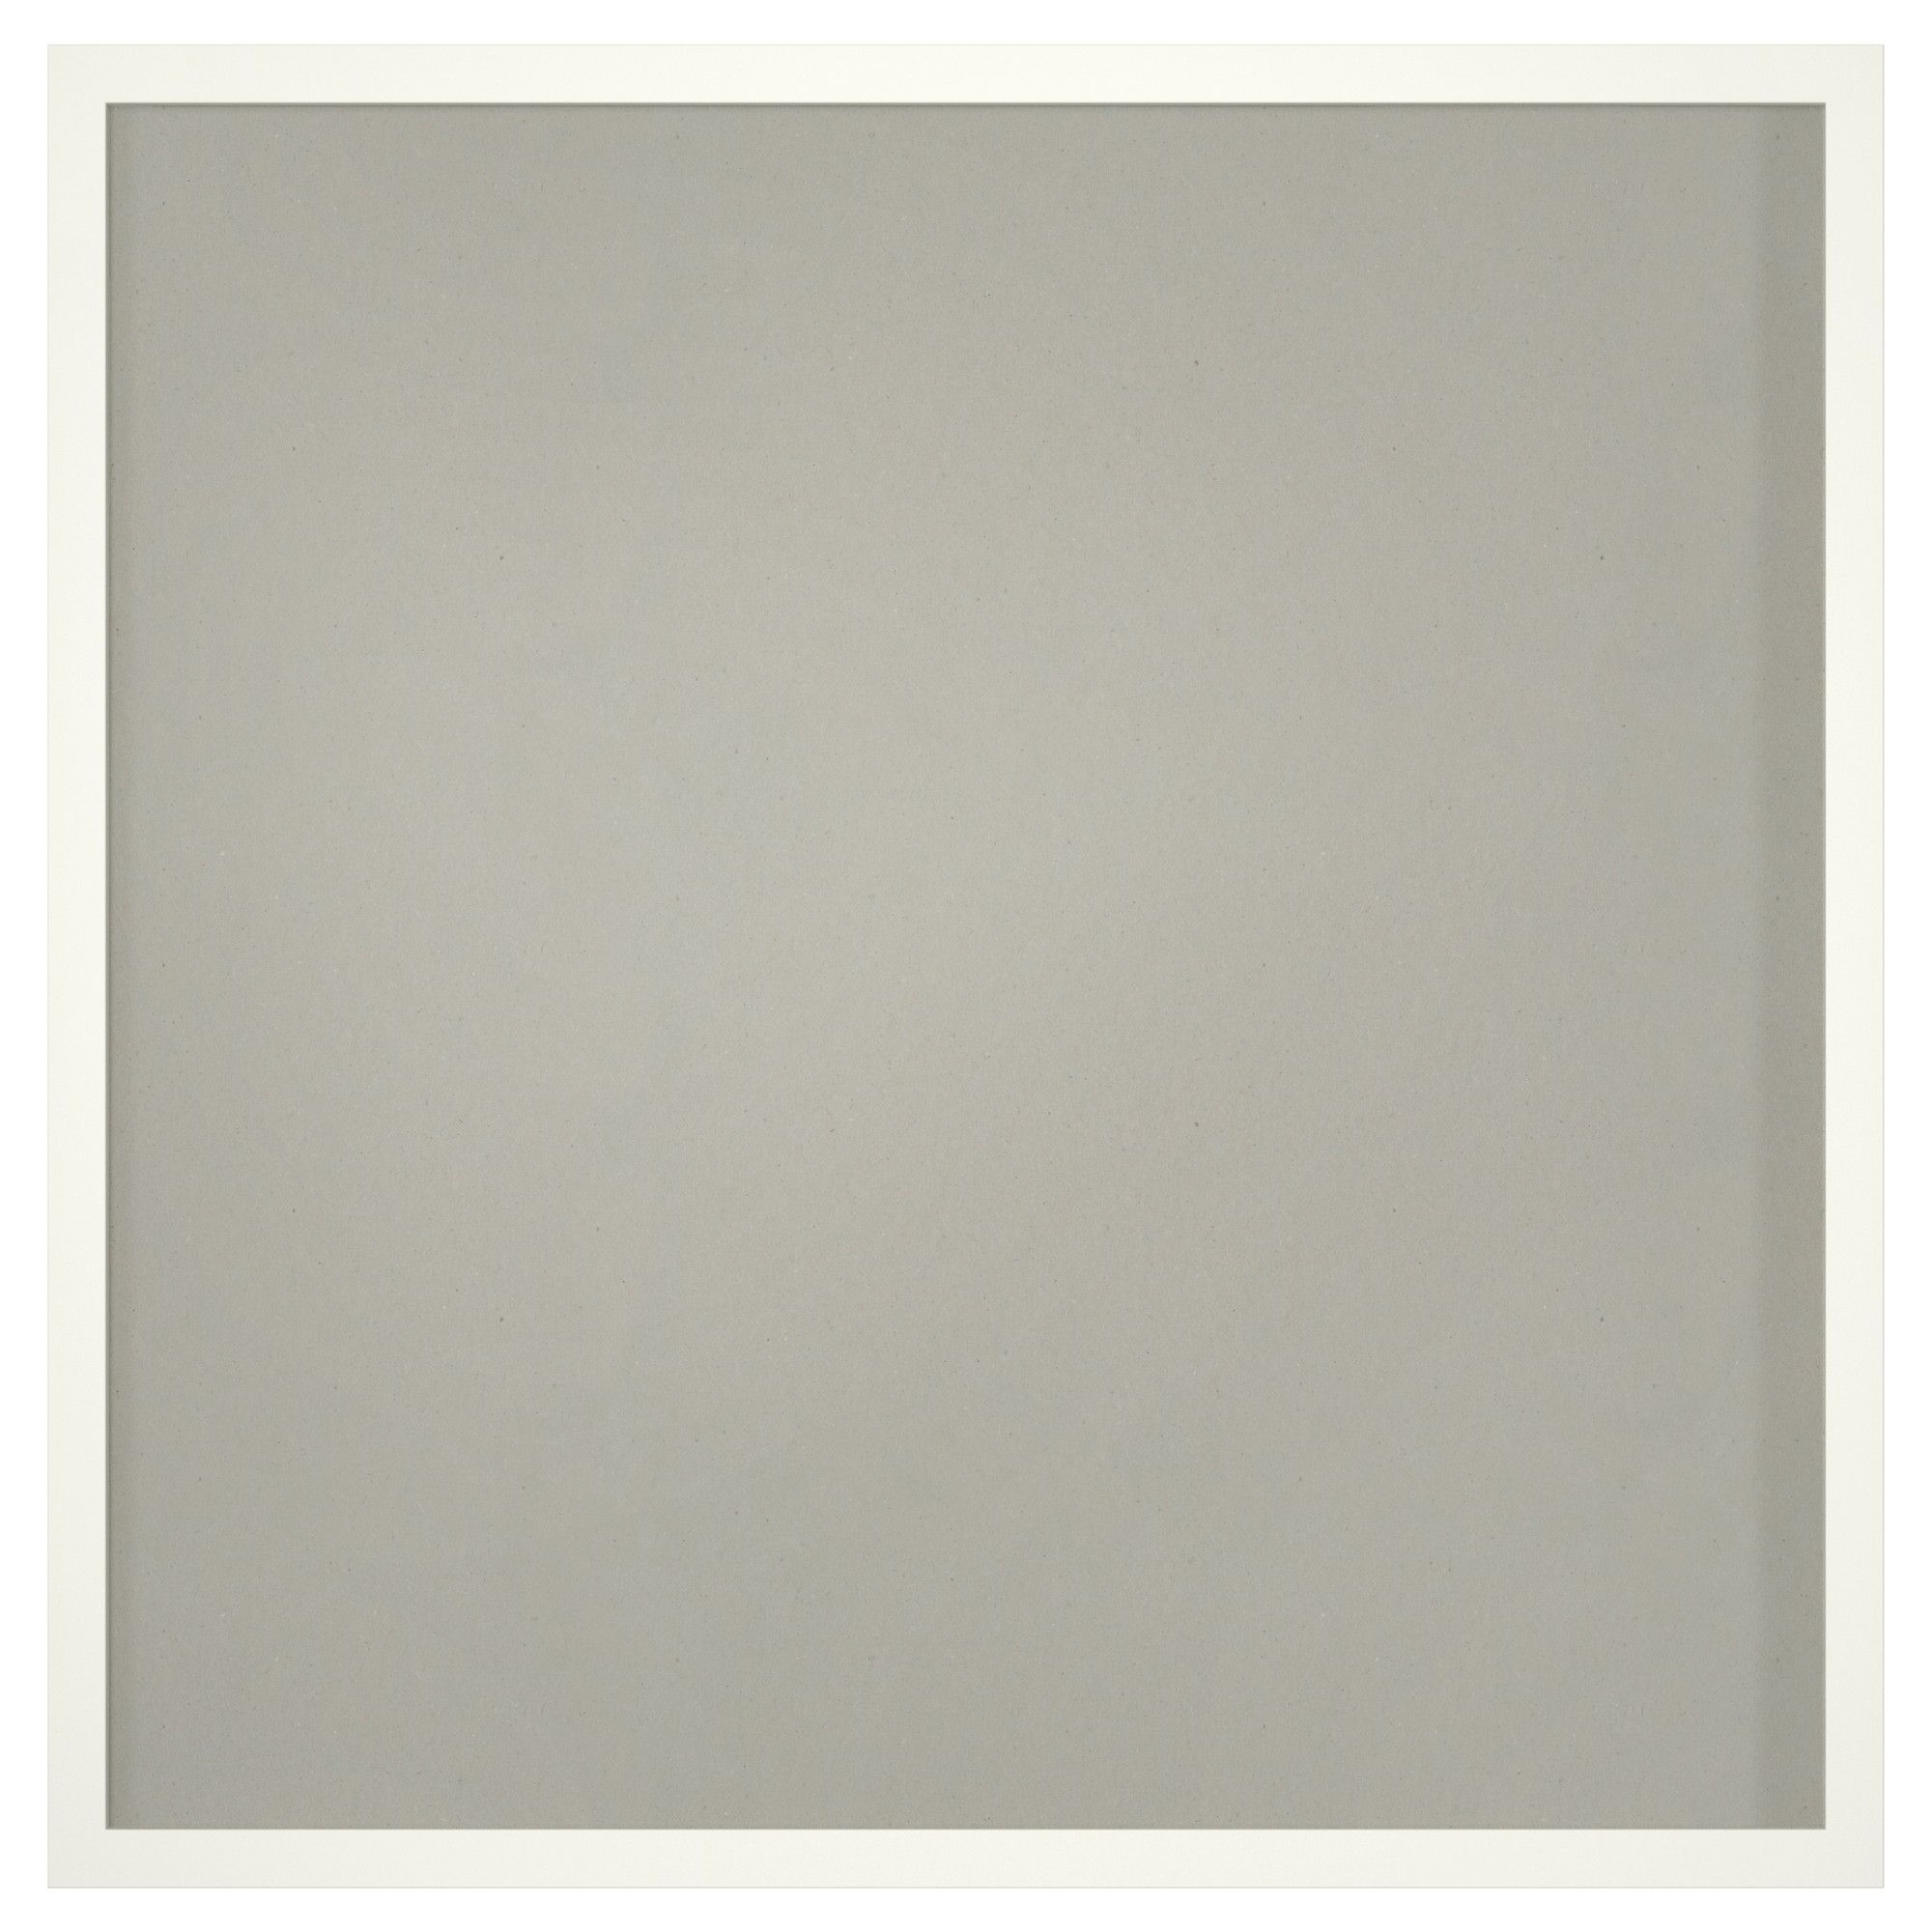 NYTTJA Marco - blanco - IKEA | I K E A | Pinterest